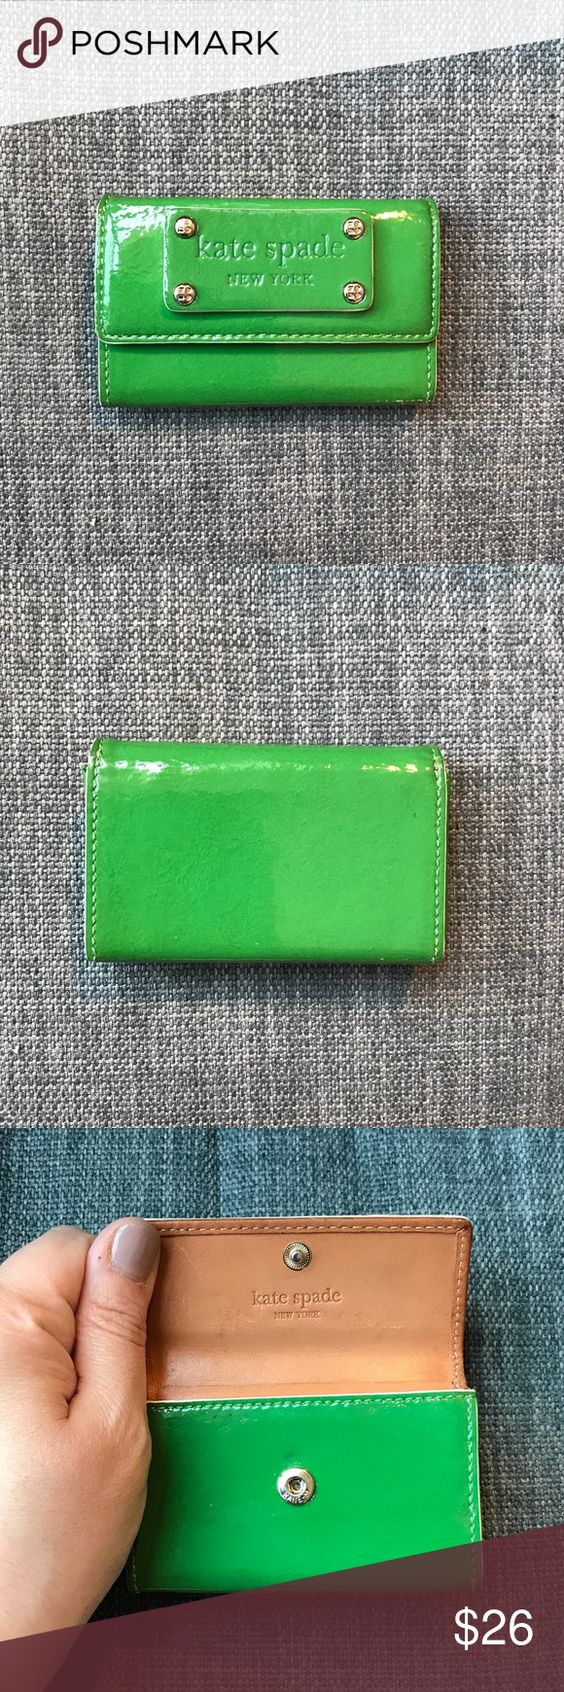 Price Drop Kate Spade Business Card Holder Green Leather Business Cards Leather Business Card Holder Business Card Holders